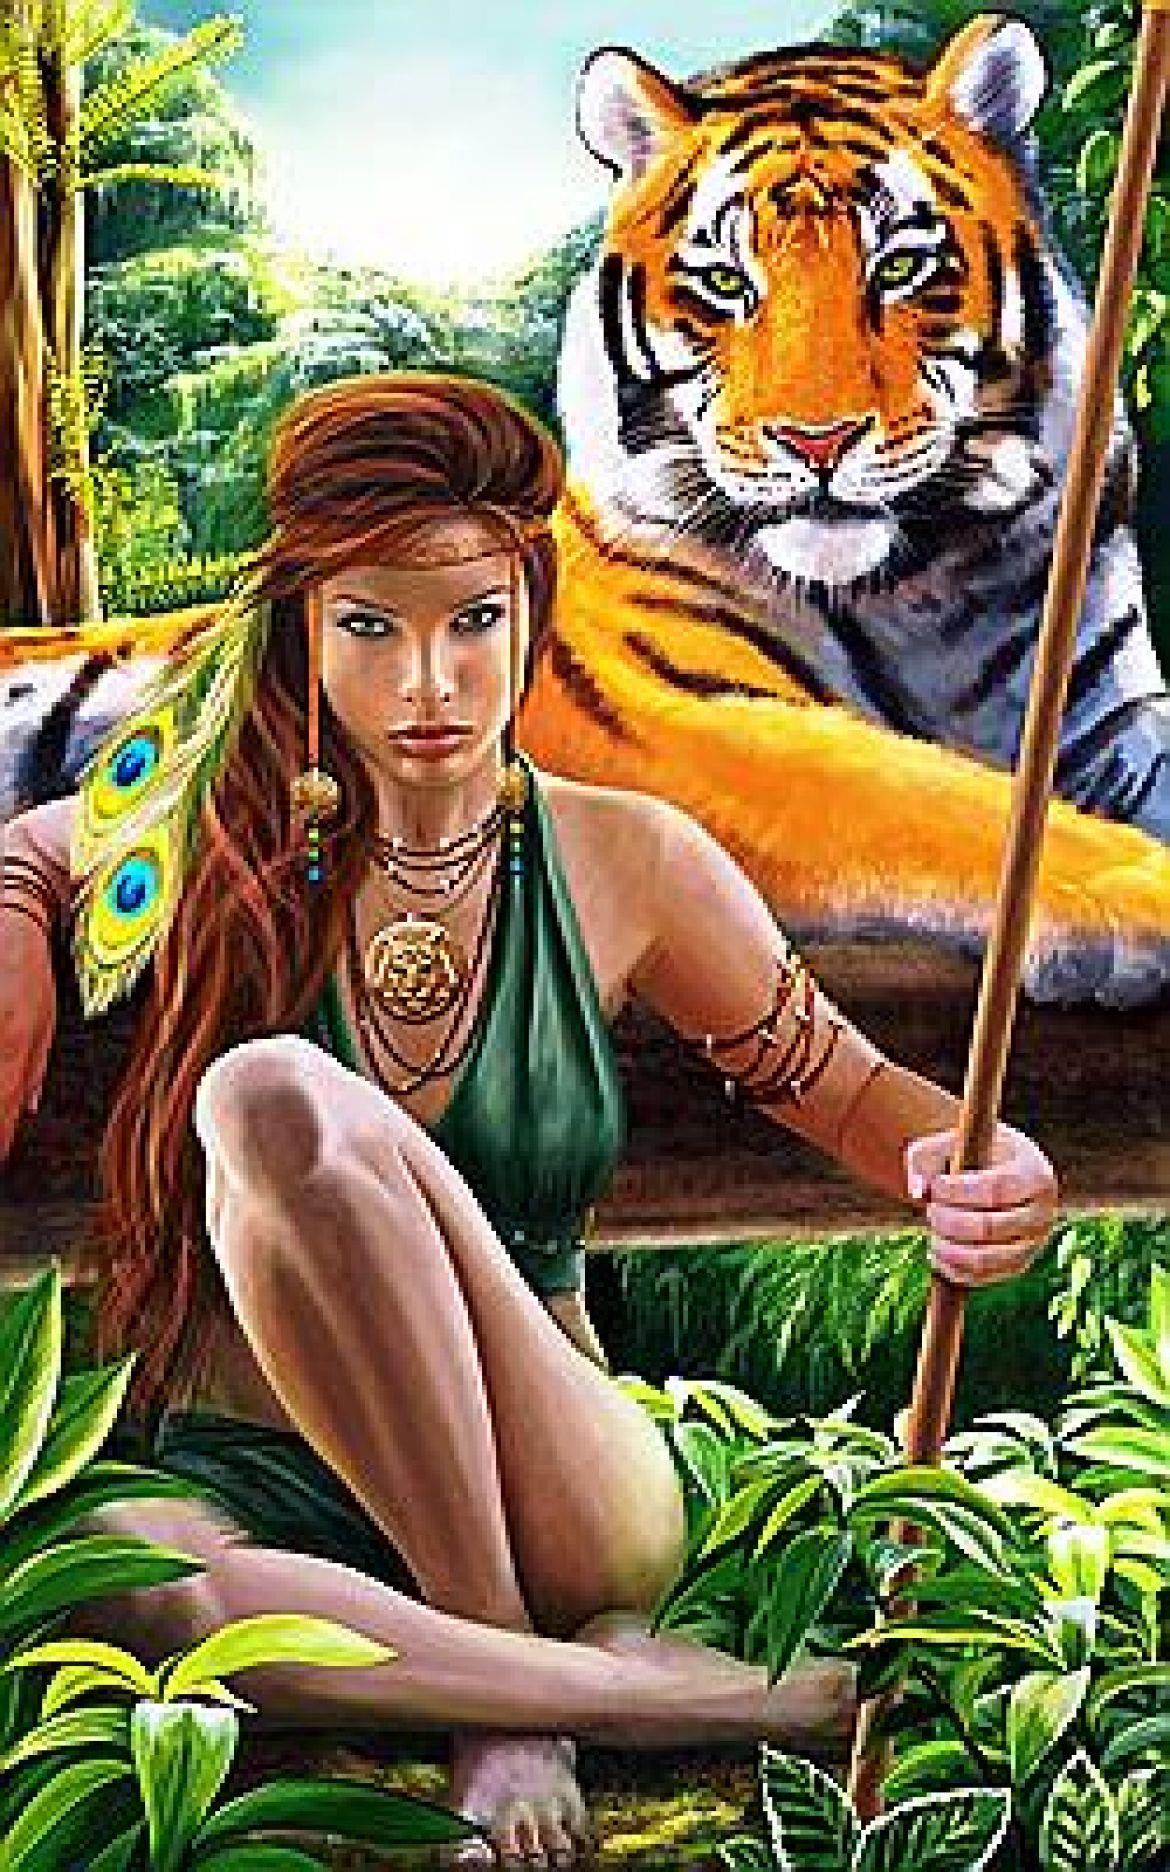 Секс древних людей в амазонках